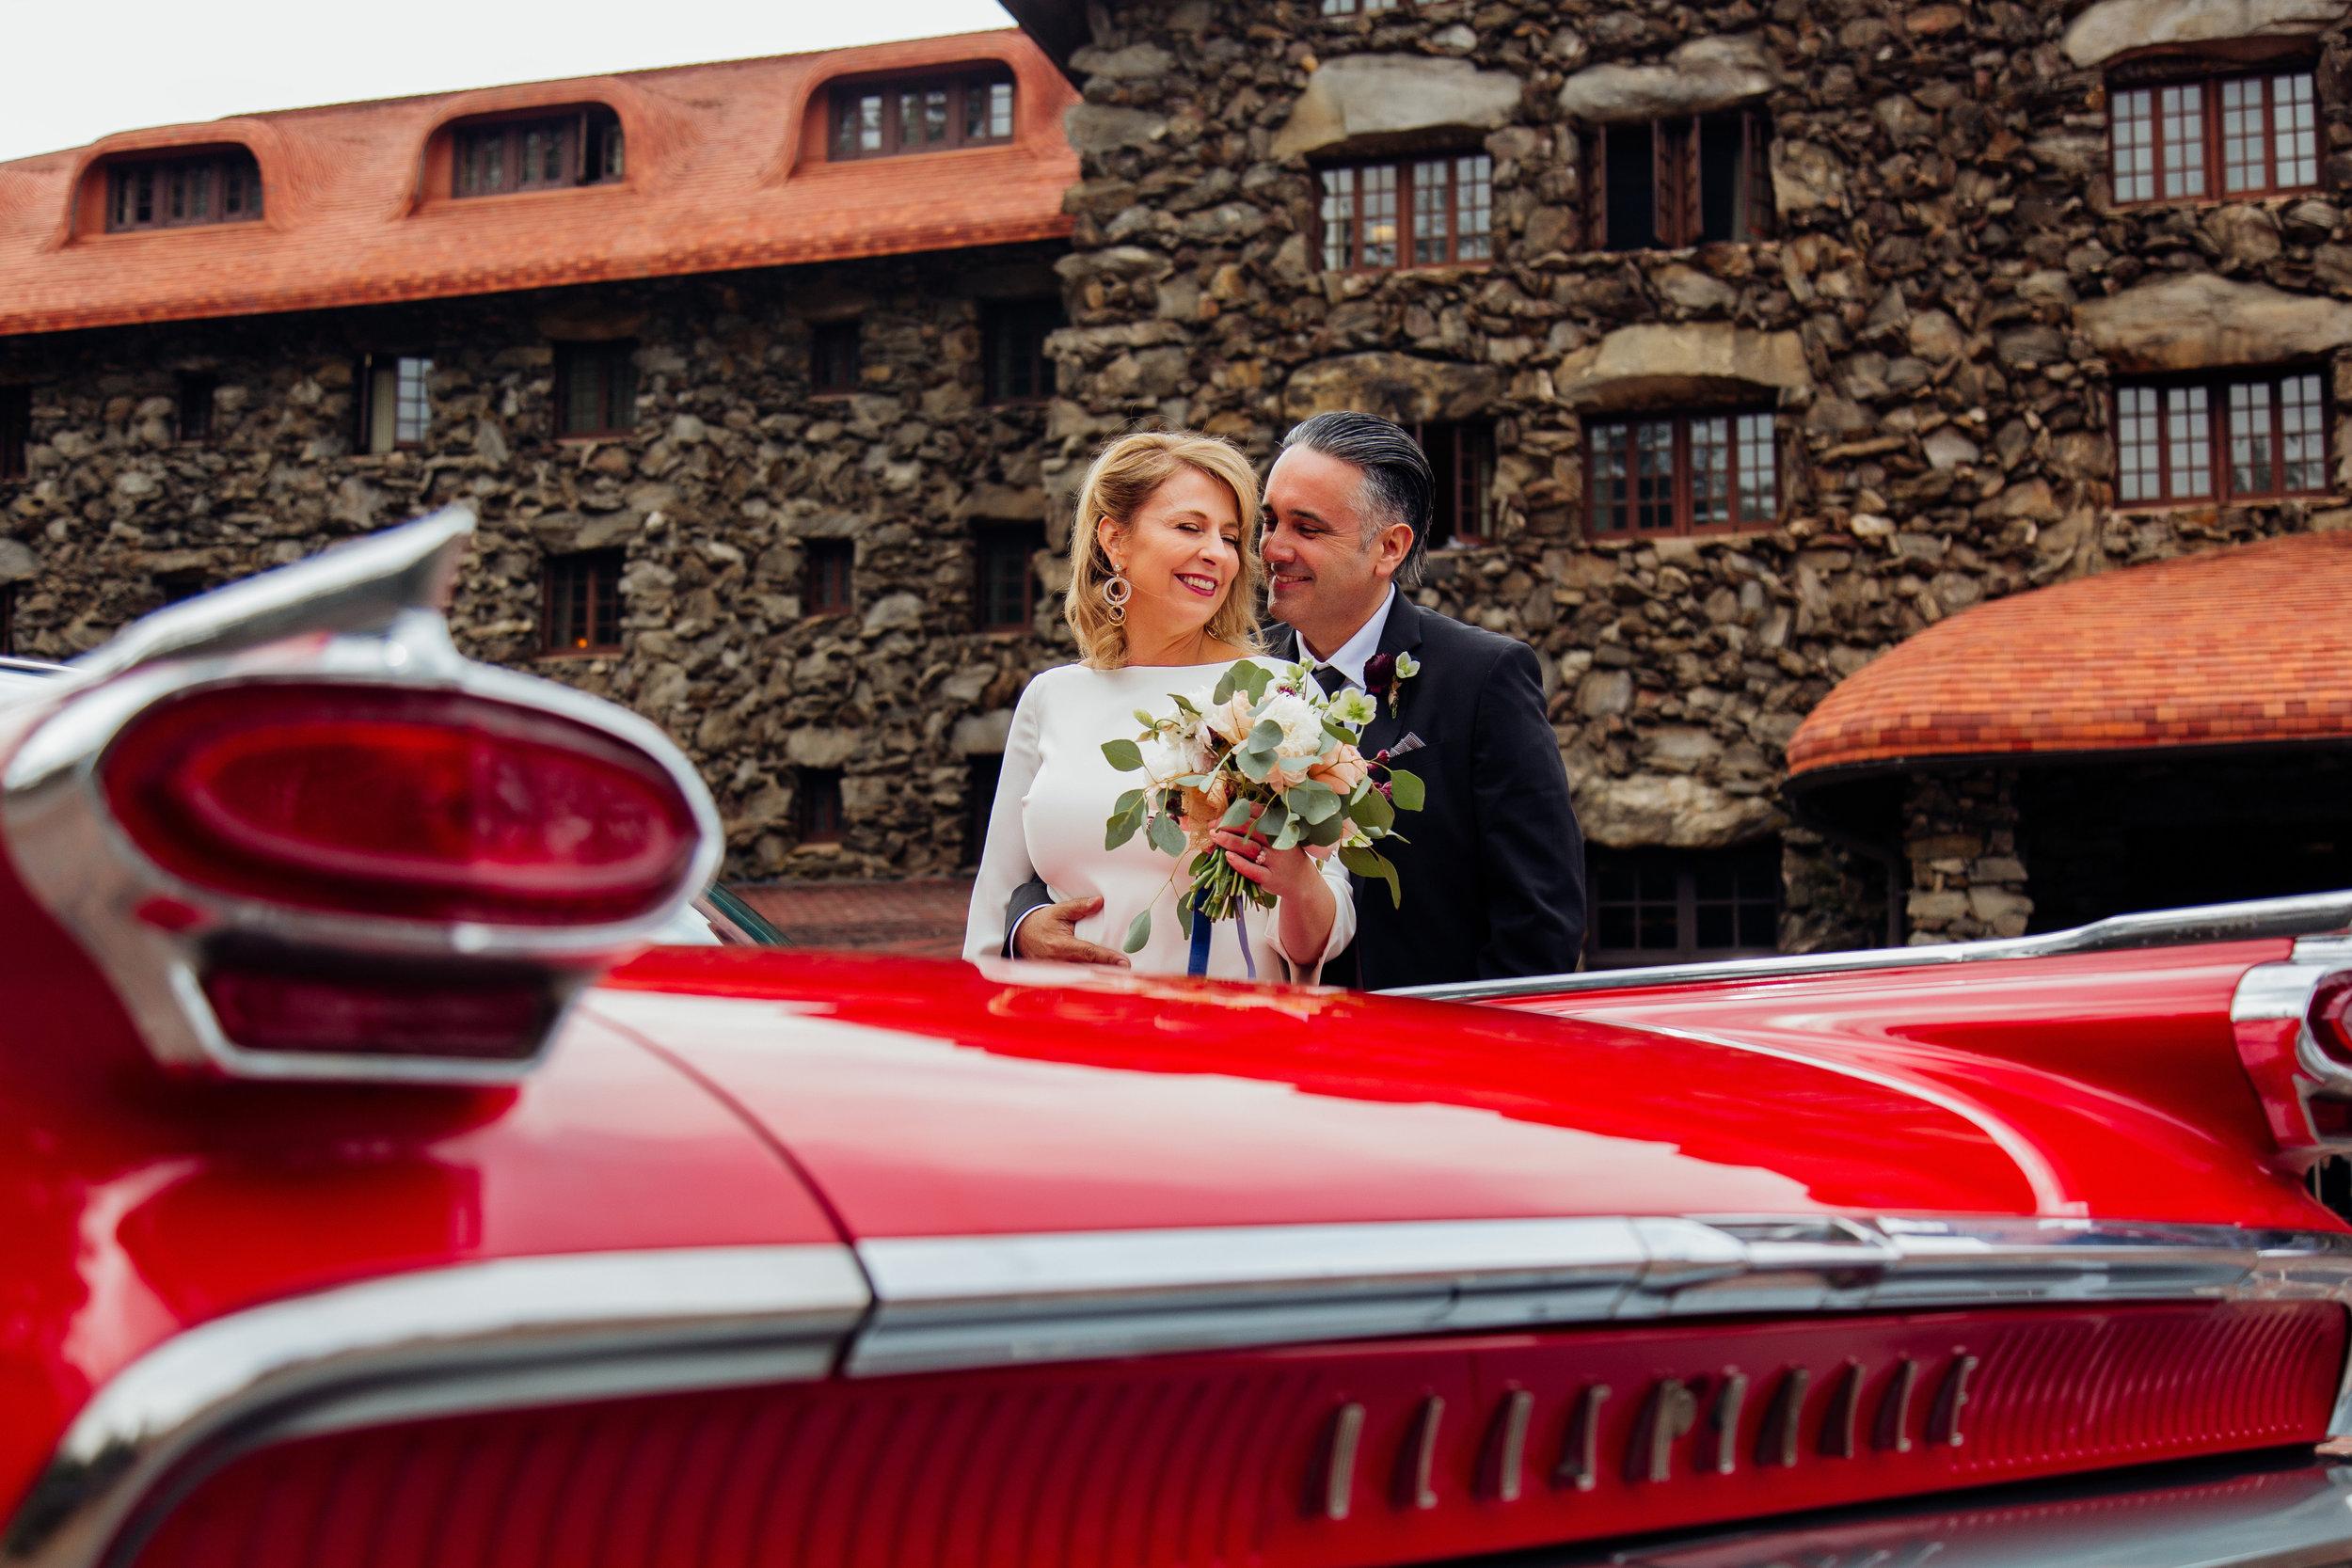 Destination Asheville Elopement at OMNI Grove Park Inn, Battery Park Book Exchange by Scarlet Plan & Design Wedding Planners & Floral Designers (48).jpg